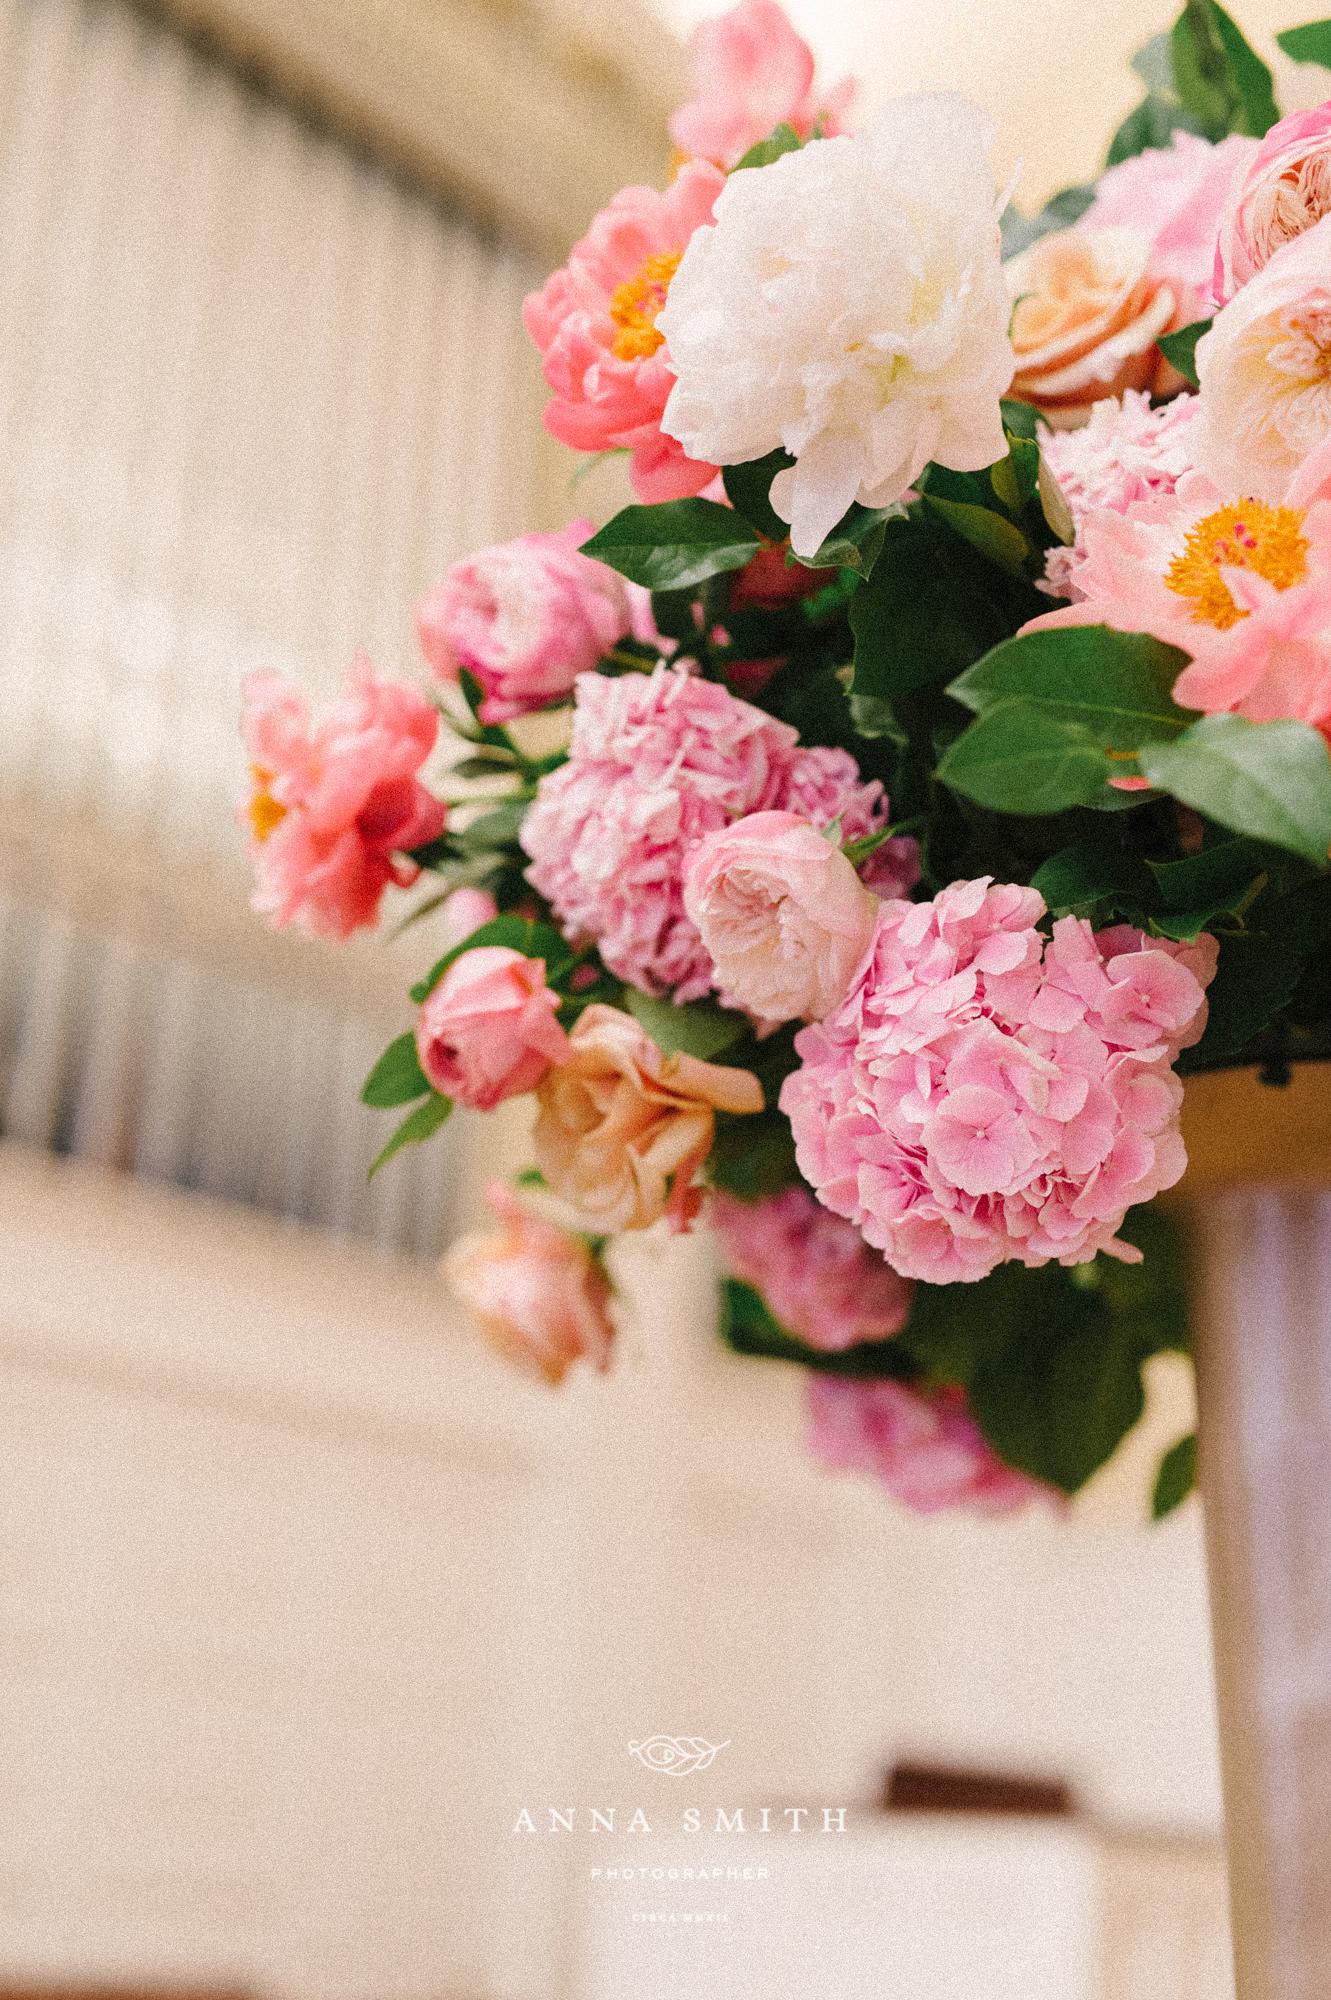 web 17- 4-W-CD-heather brandon wedding perkins adolphus-398.jpg